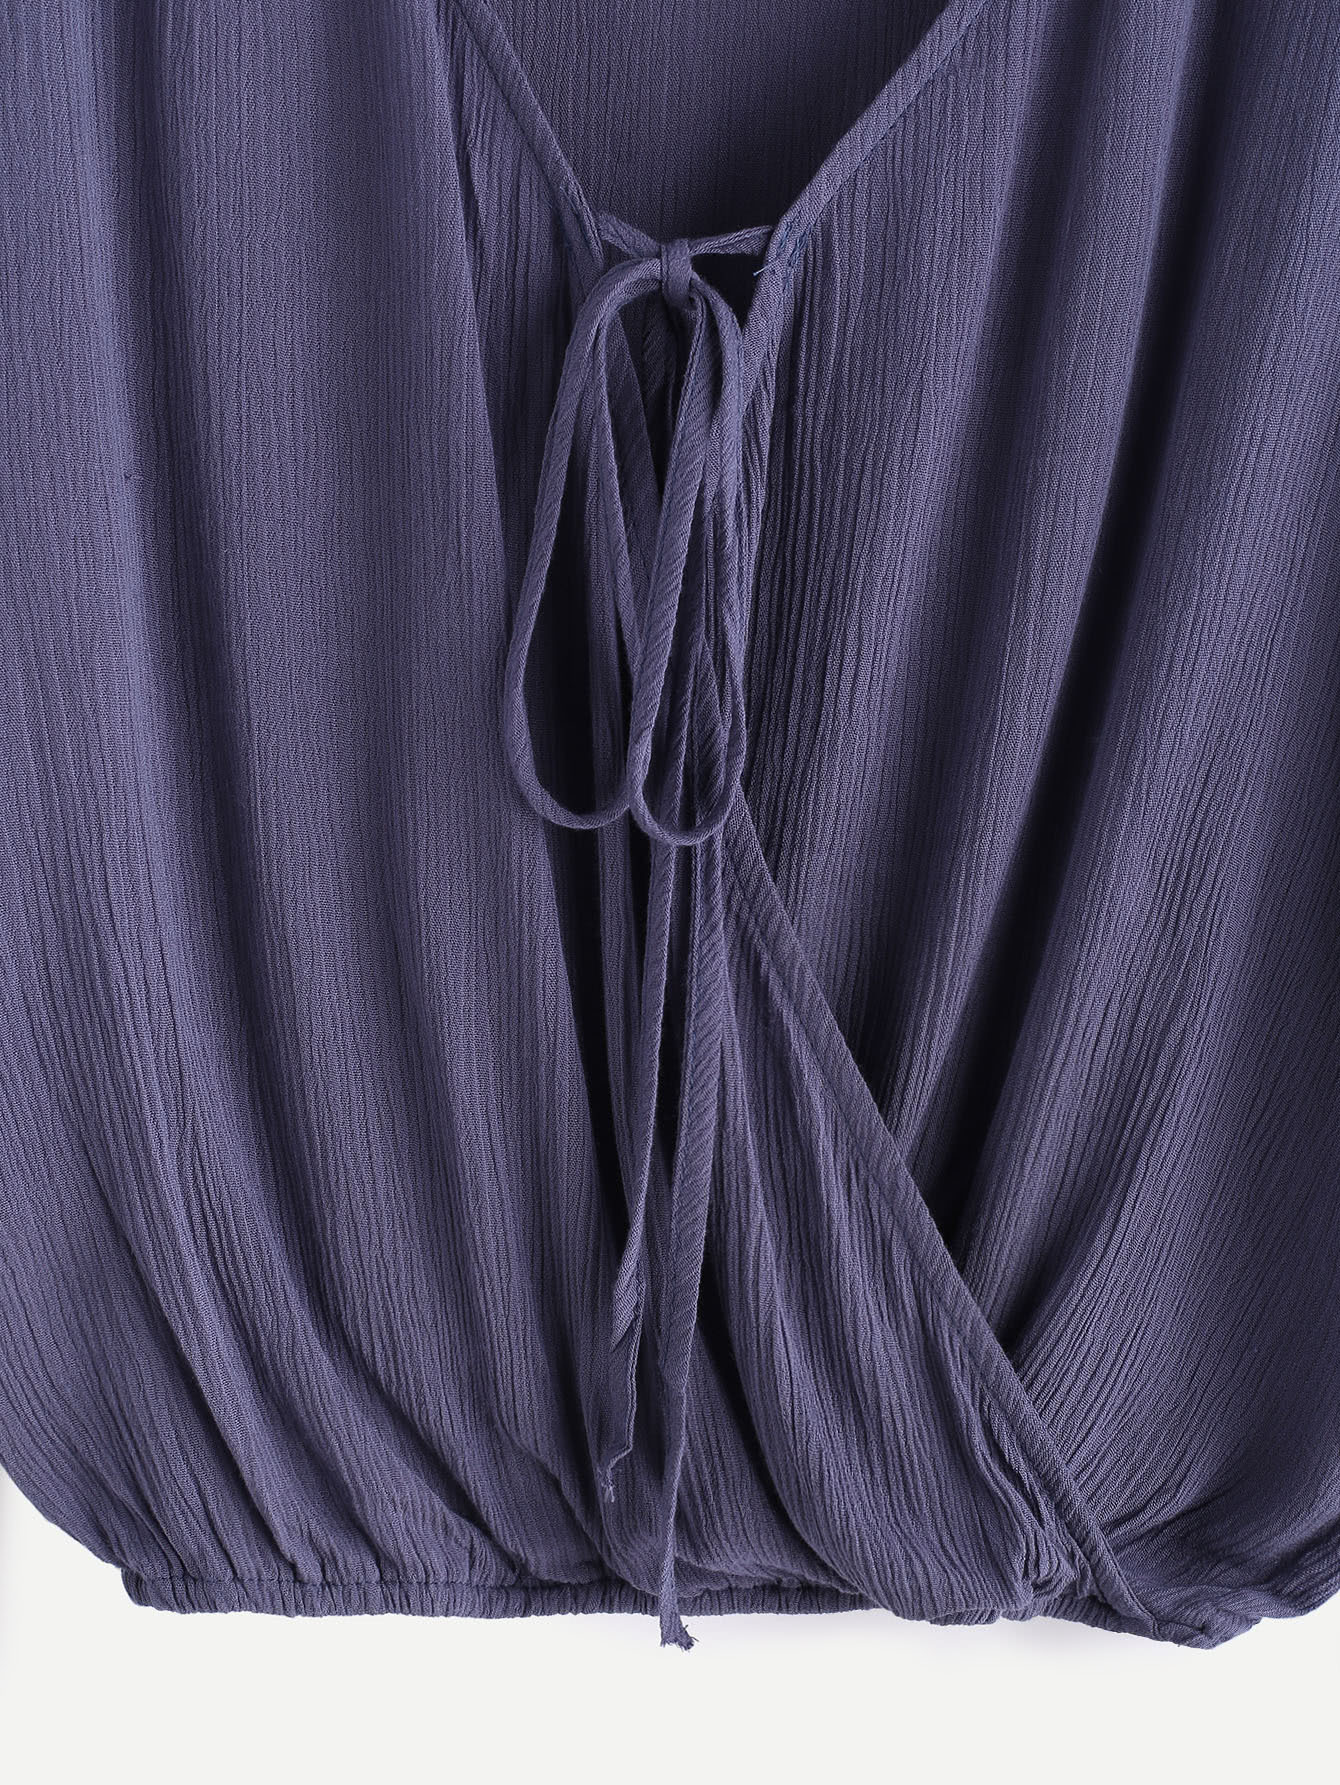 blouse170315003_2